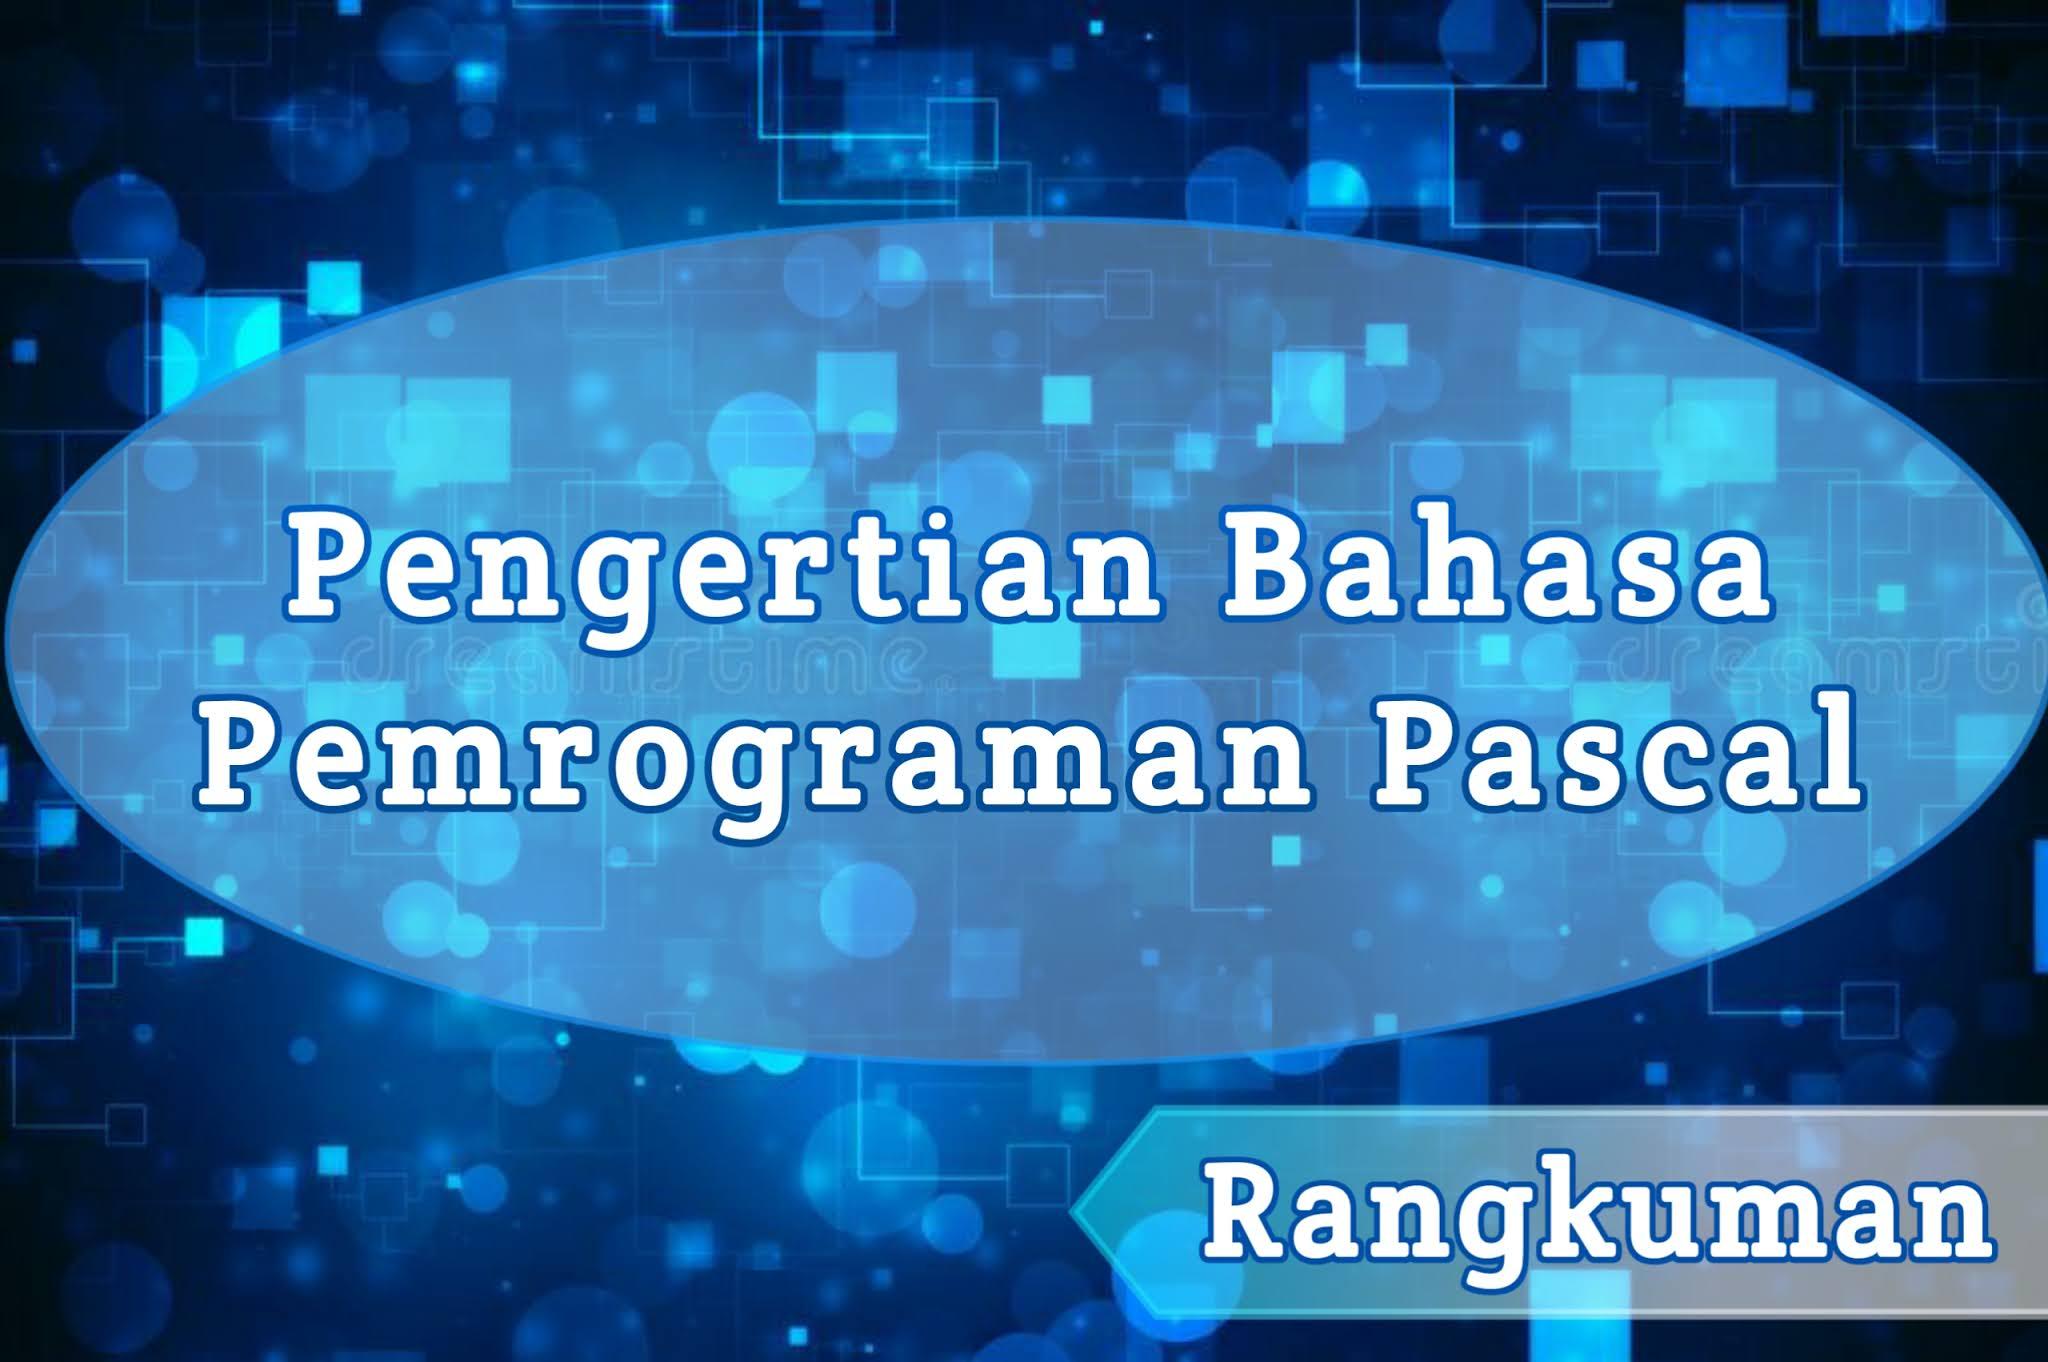 Rangkuman Pengertian Bahasa Pemrograman Pascal